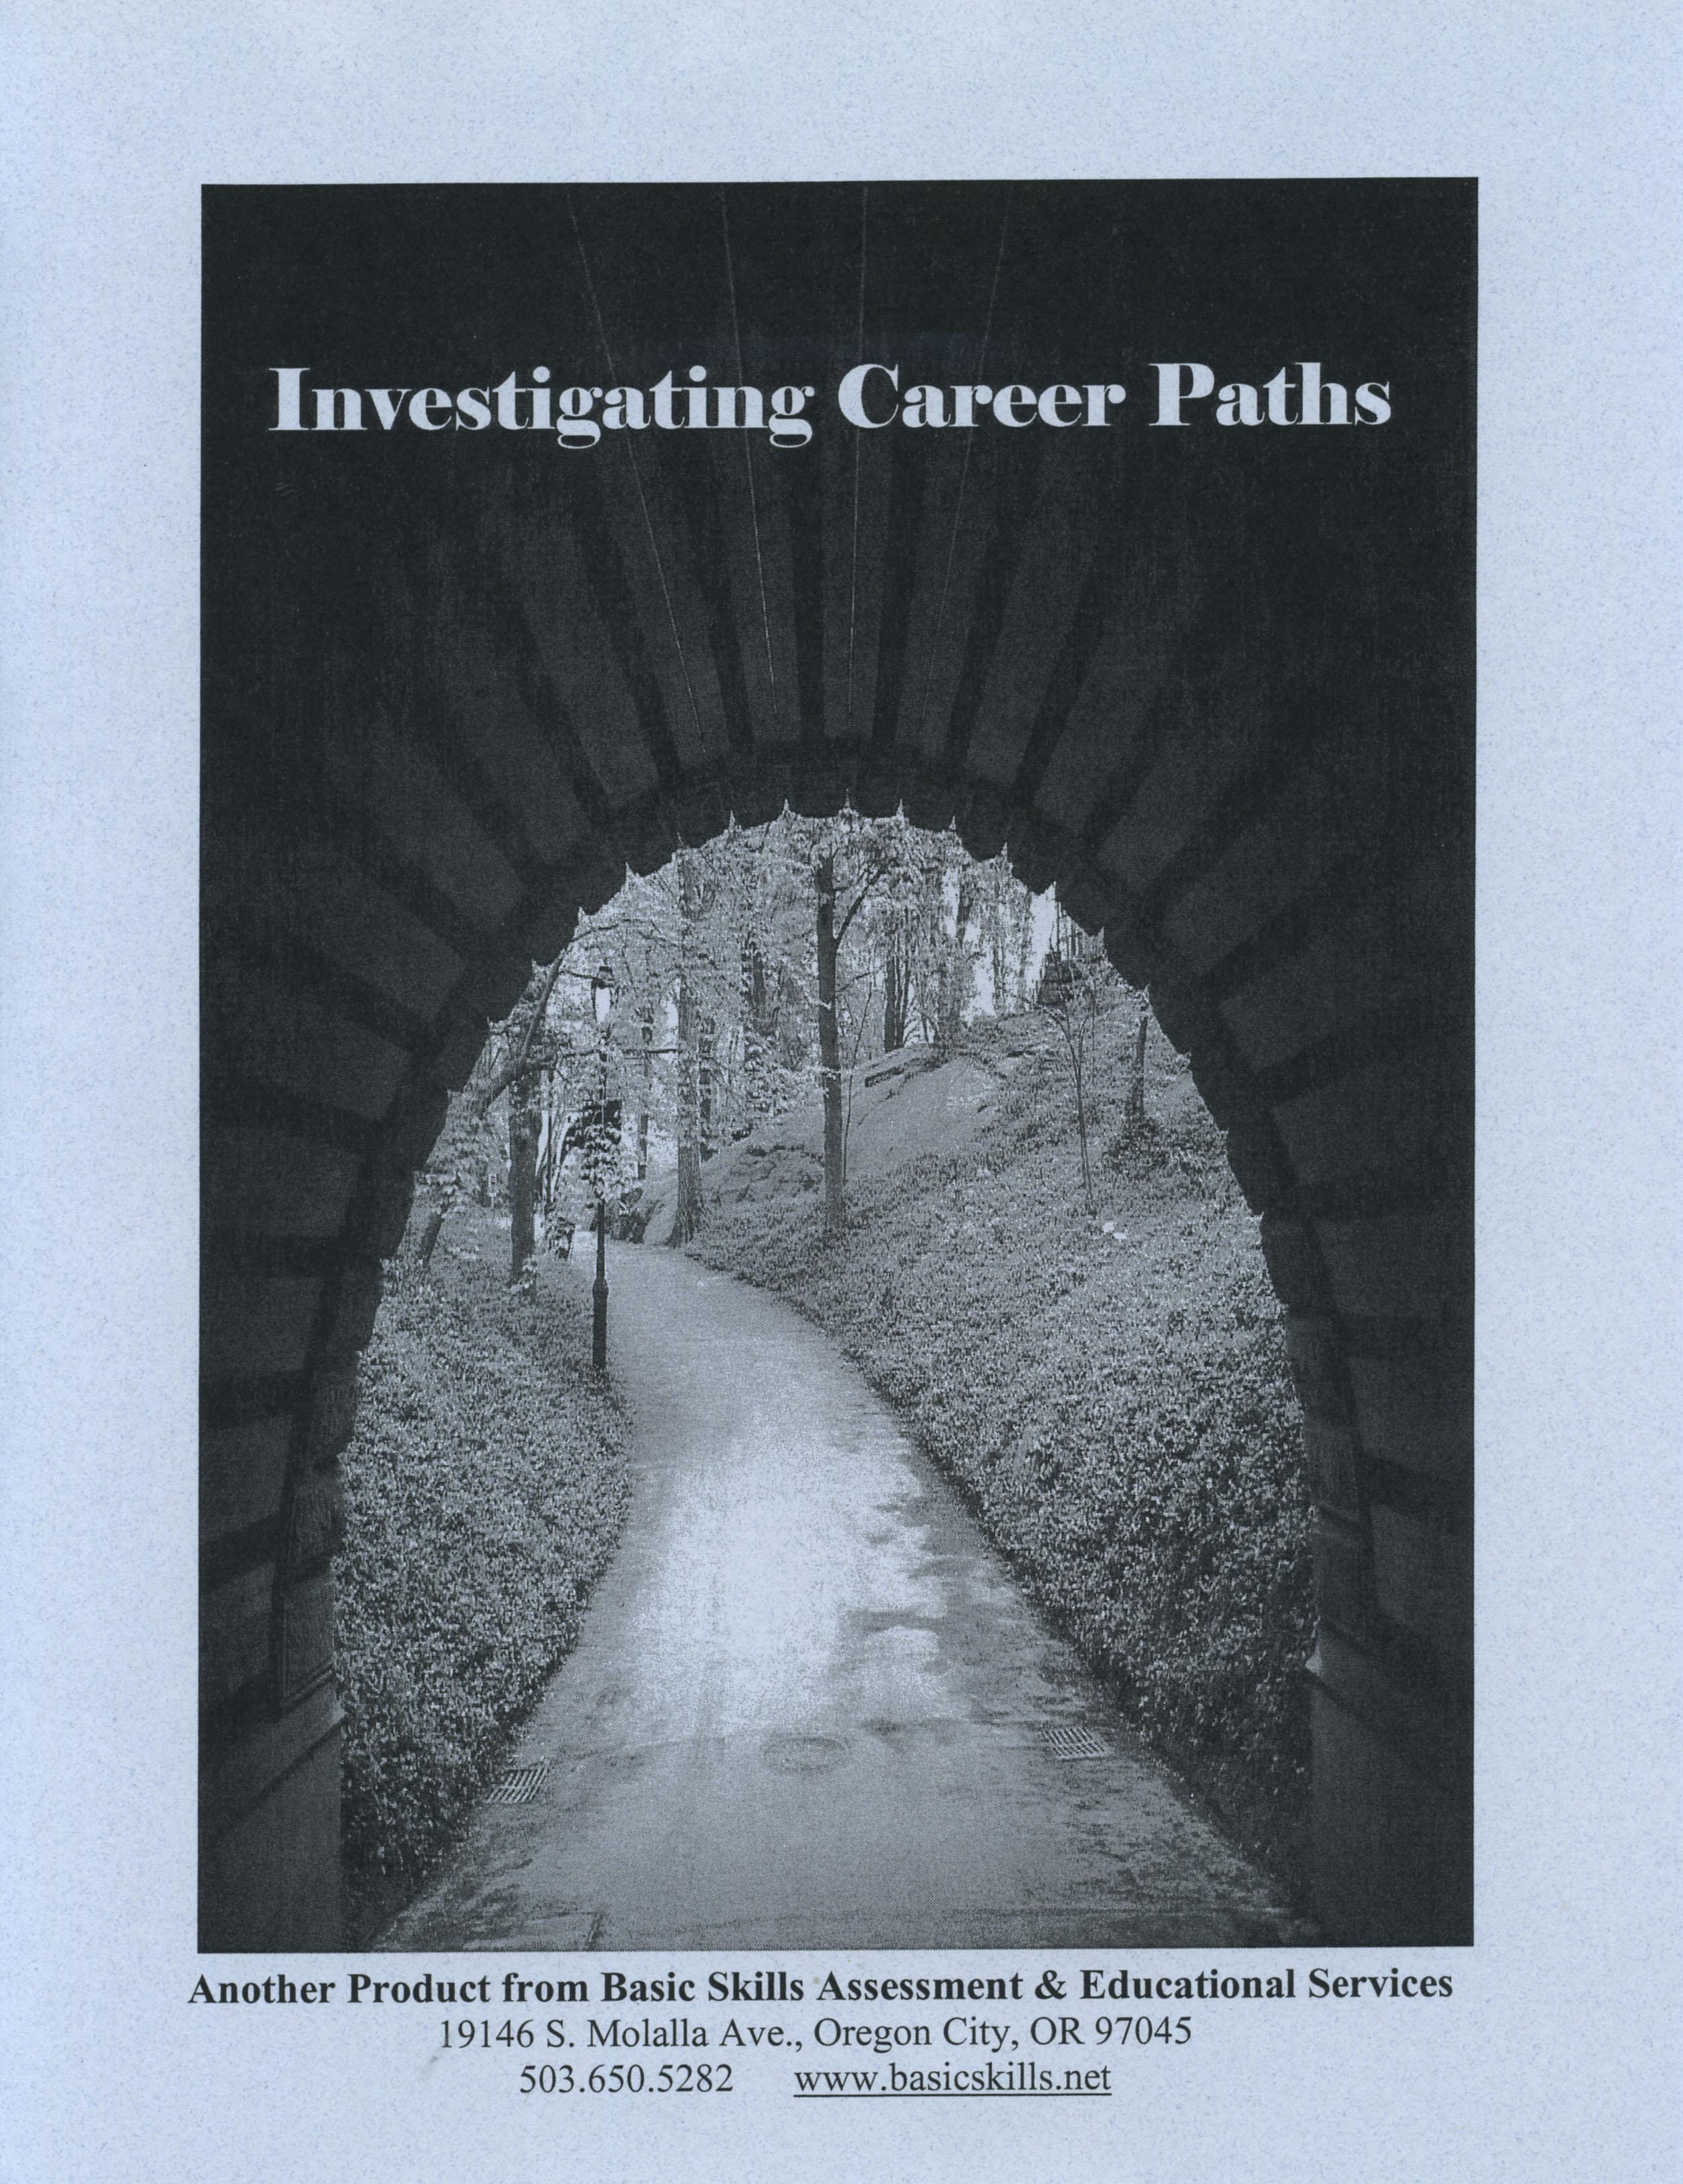 Investigating Career Paths